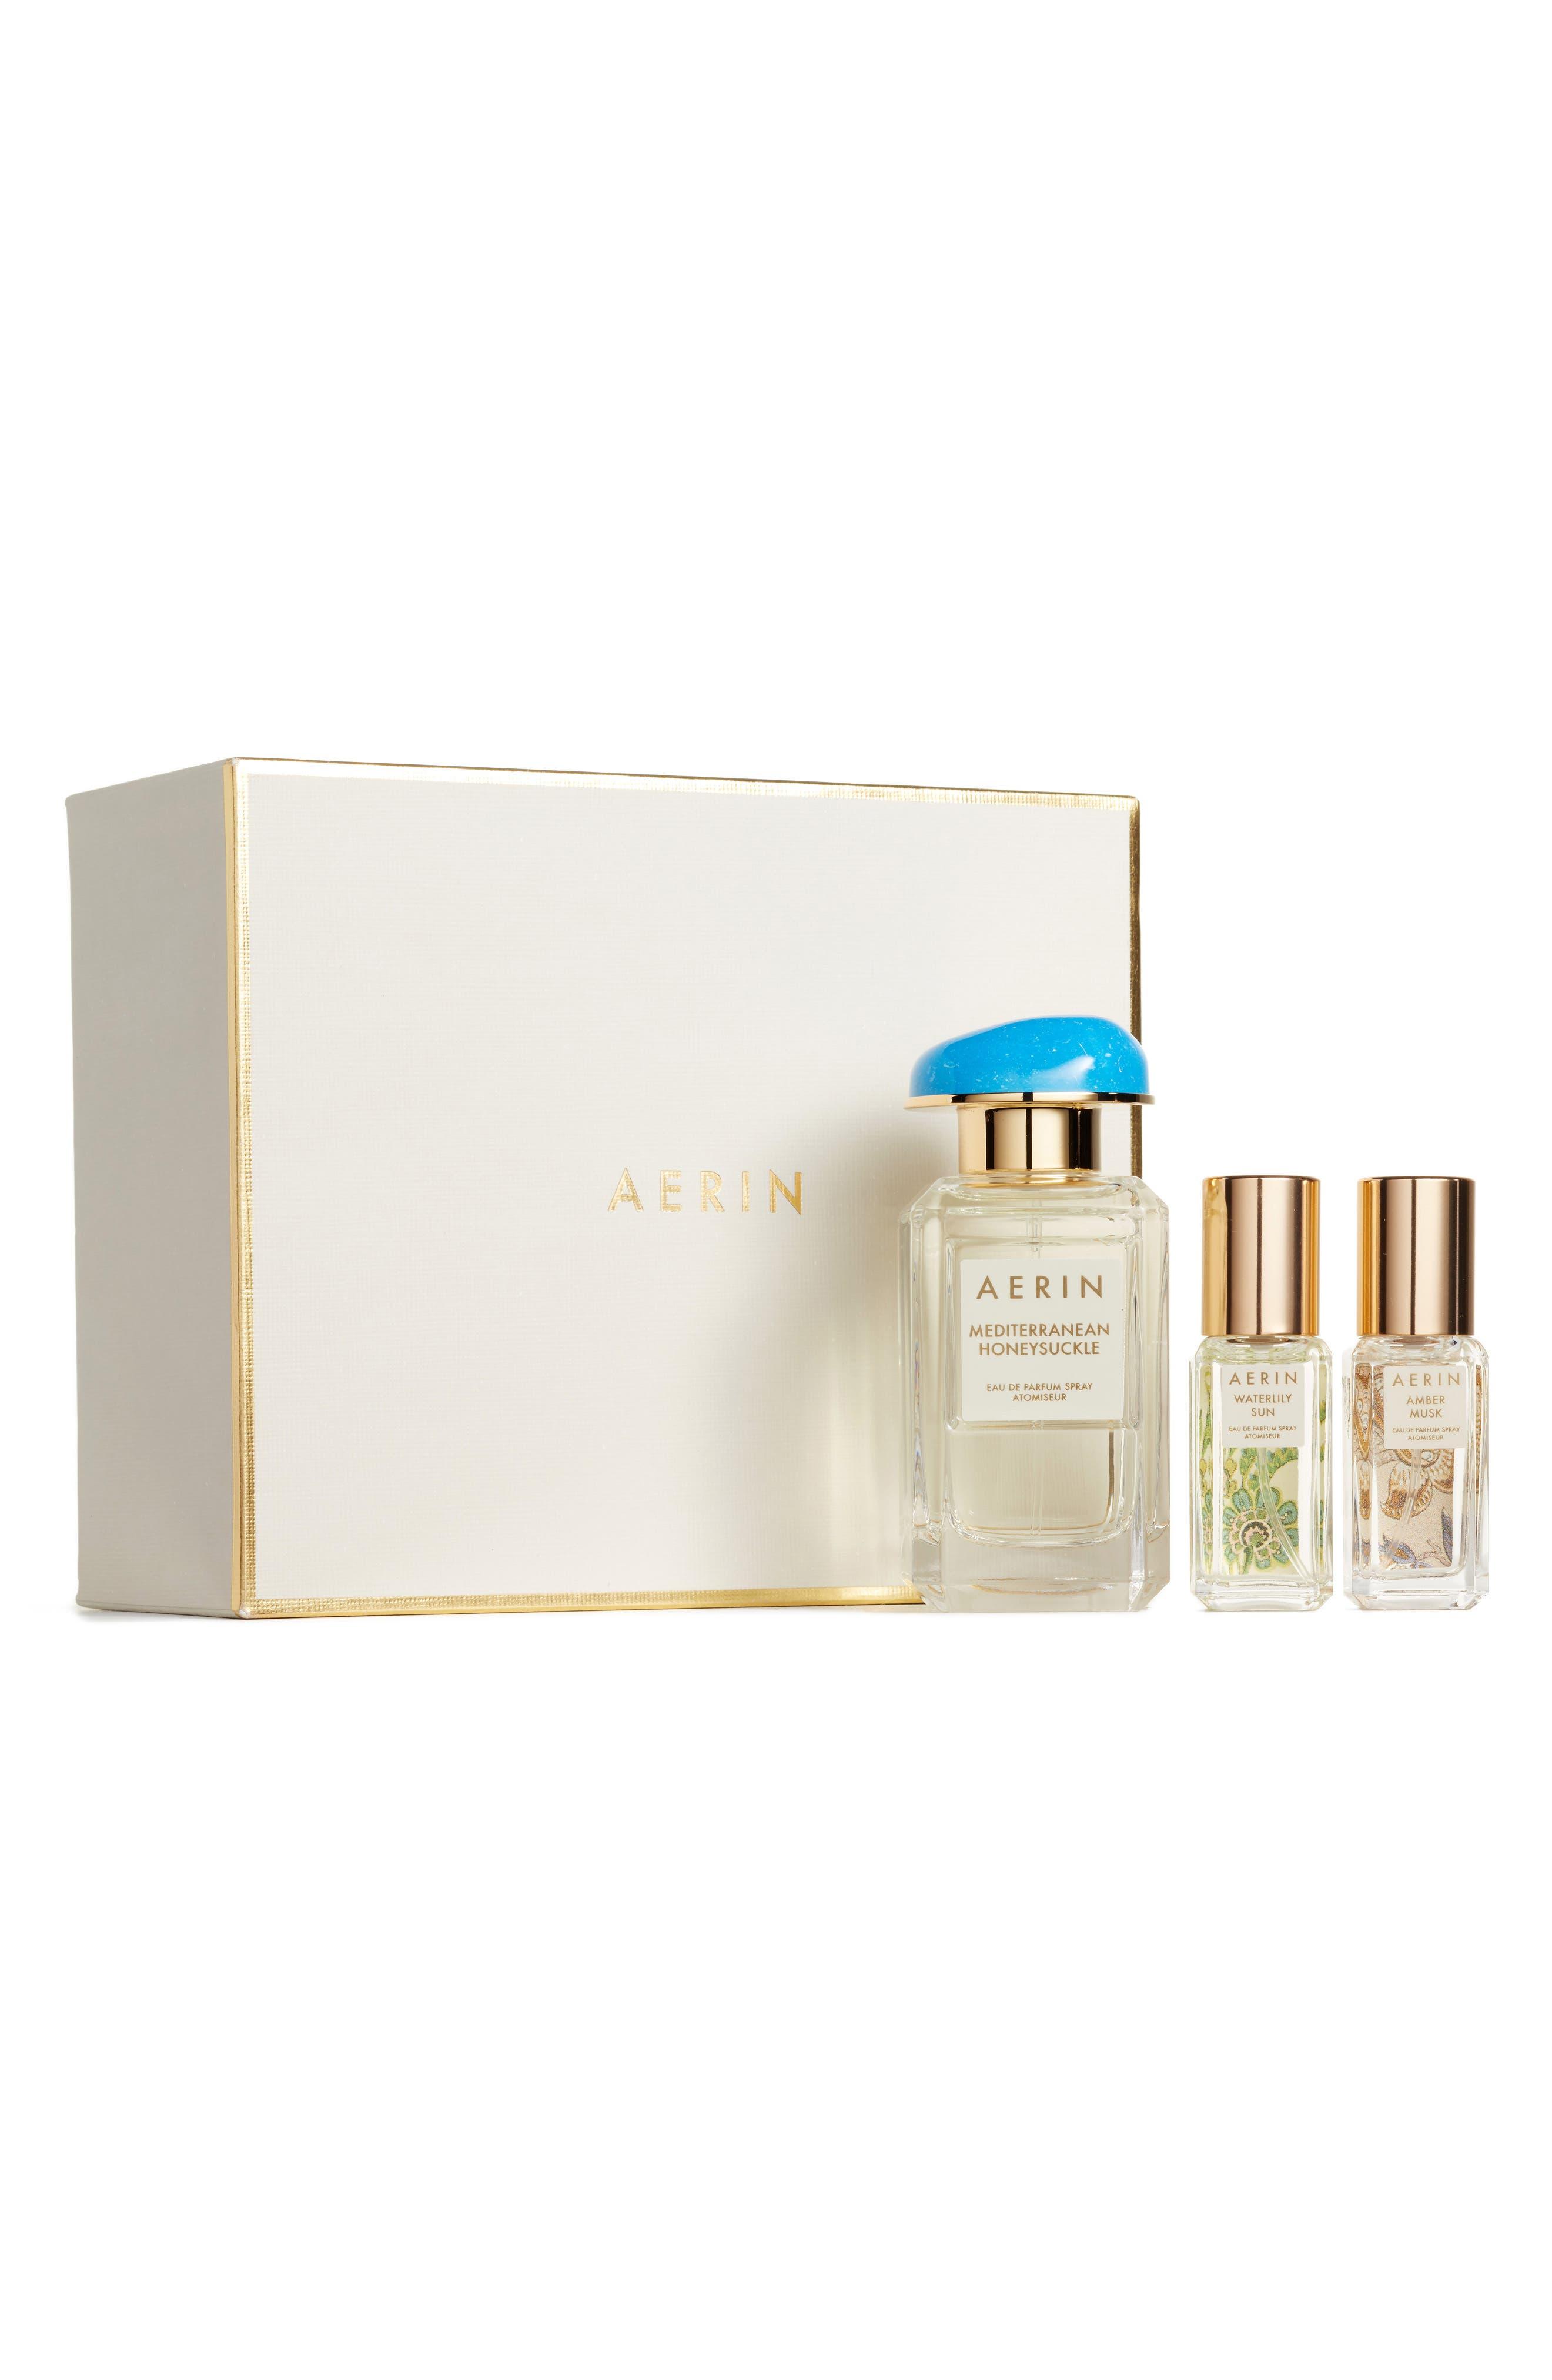 ESTÉE LAUDER AERIN Beauty Mediterranean Honeysuckle Fragrance Set